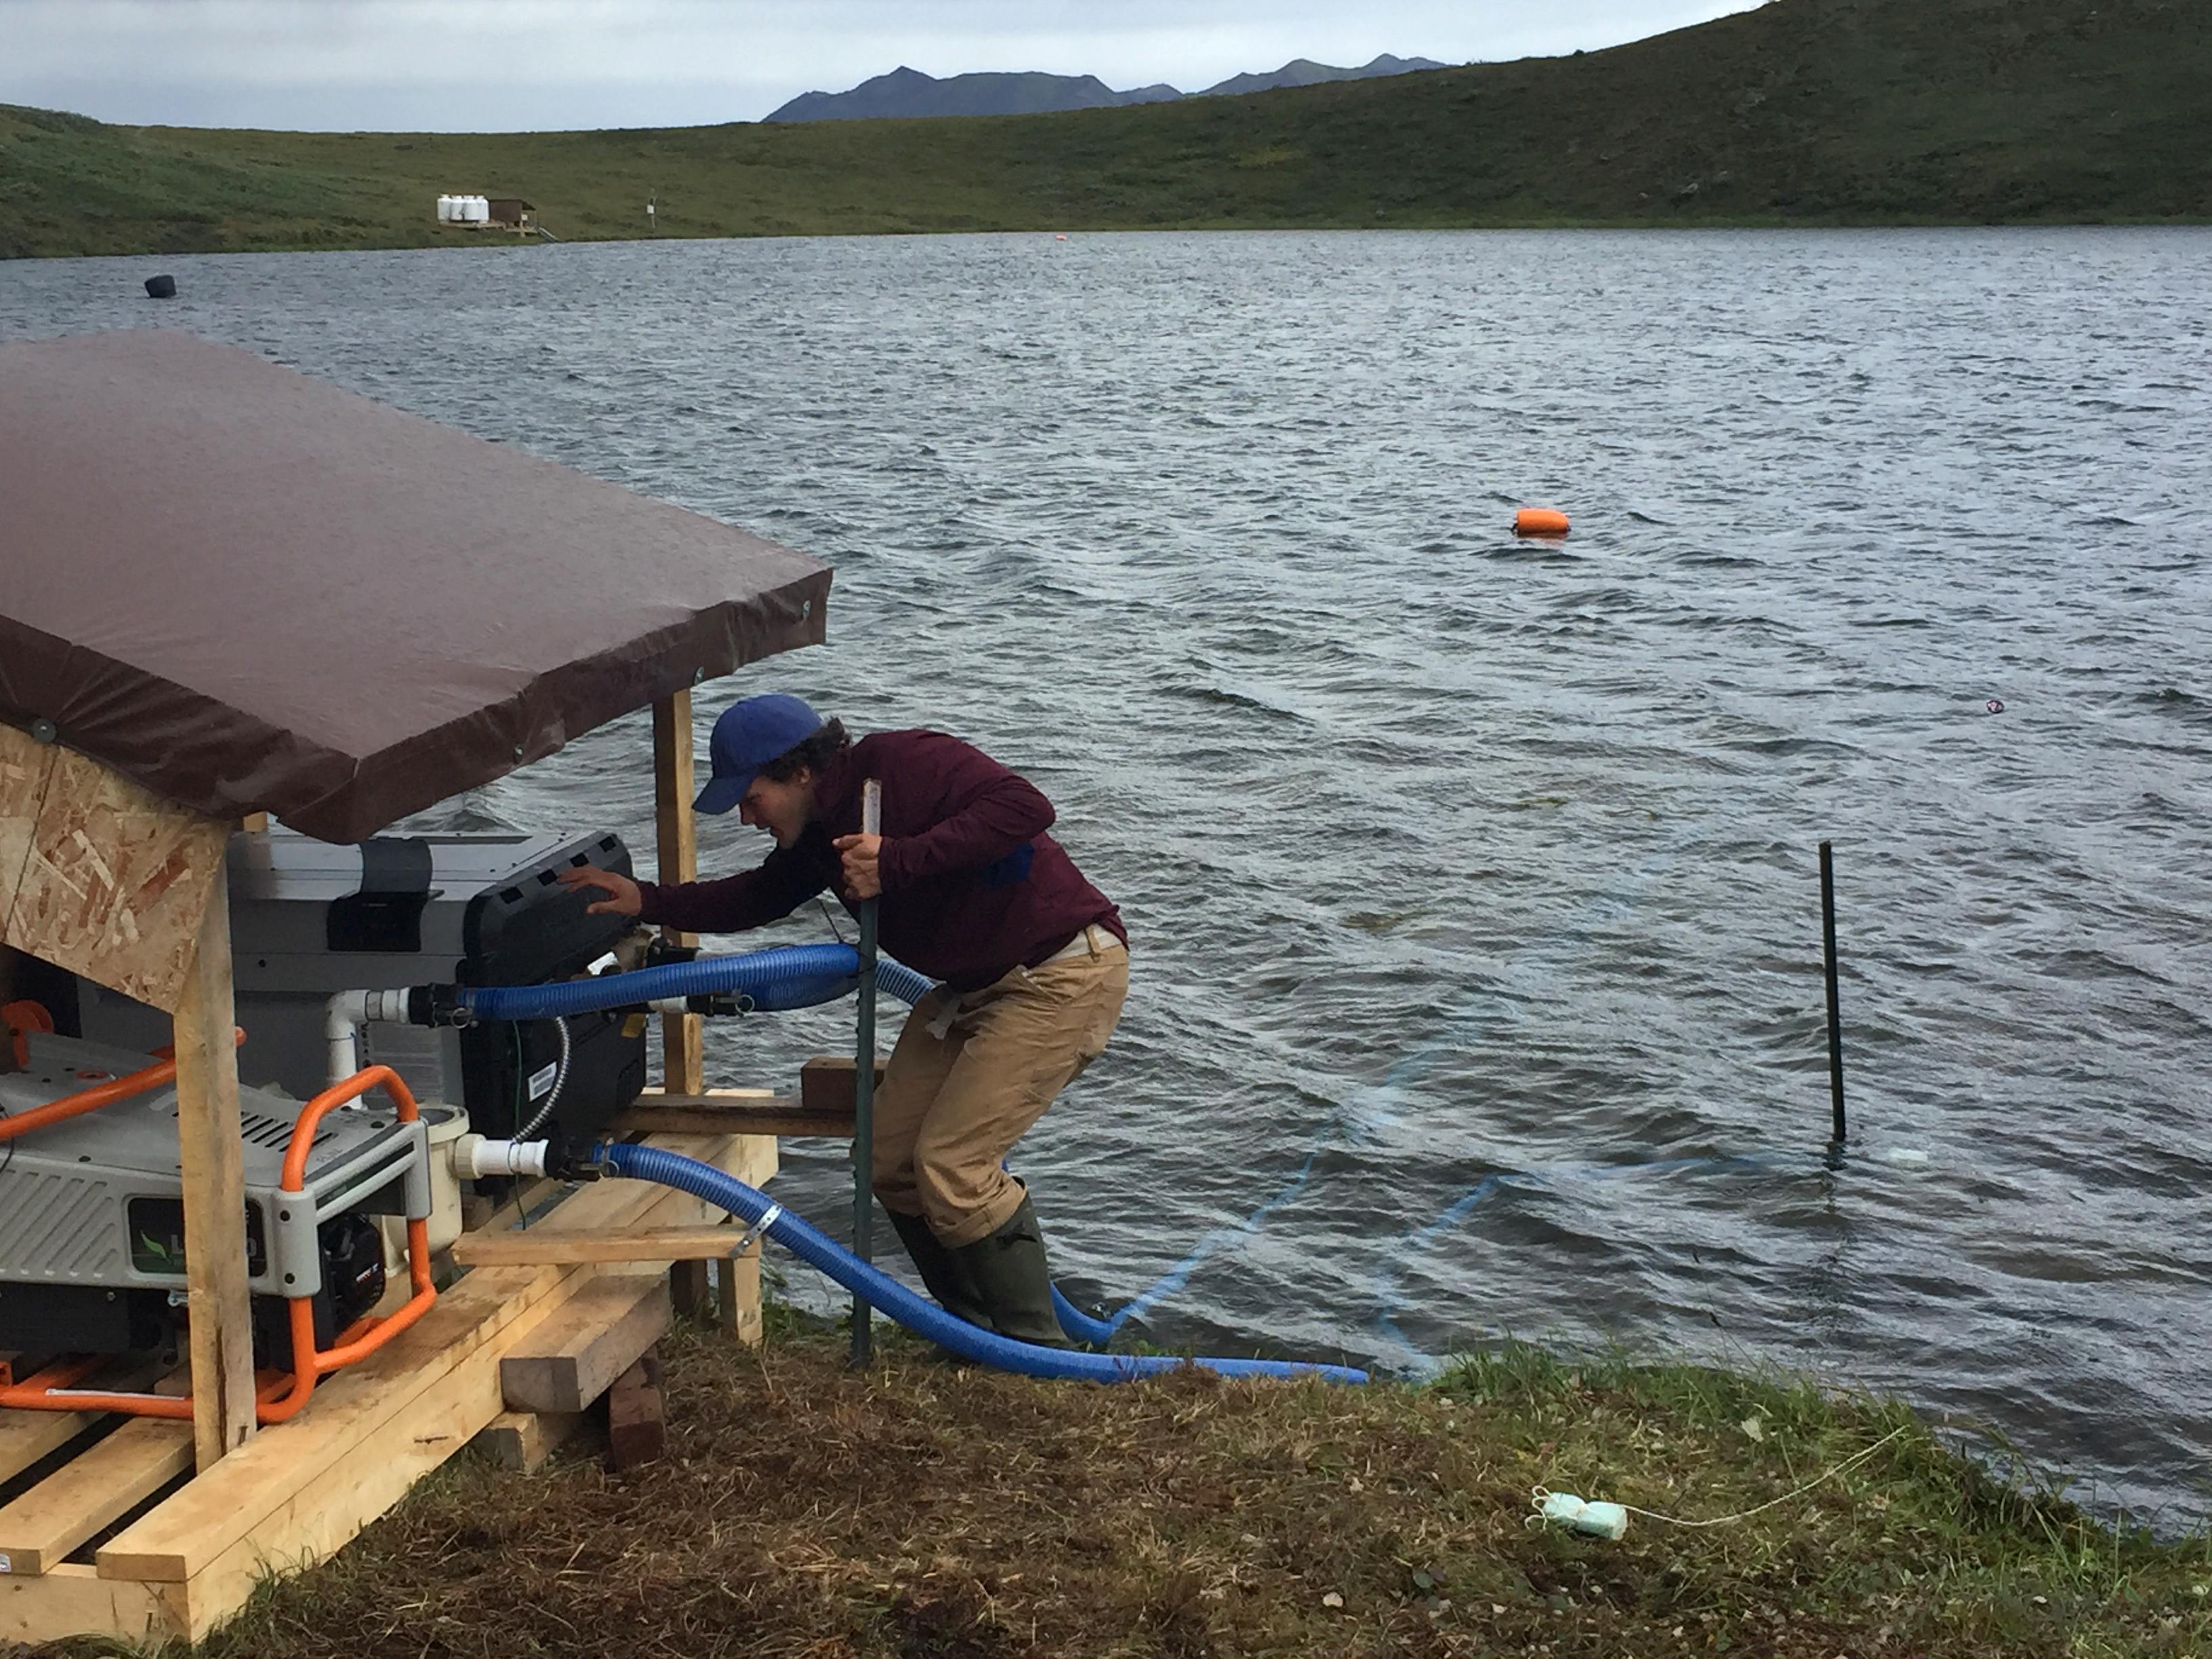 Nick Barrett works on the swimming pool heater used to heat Fog 1 lake on August 2, 2017. (Kelsey Lindsey)